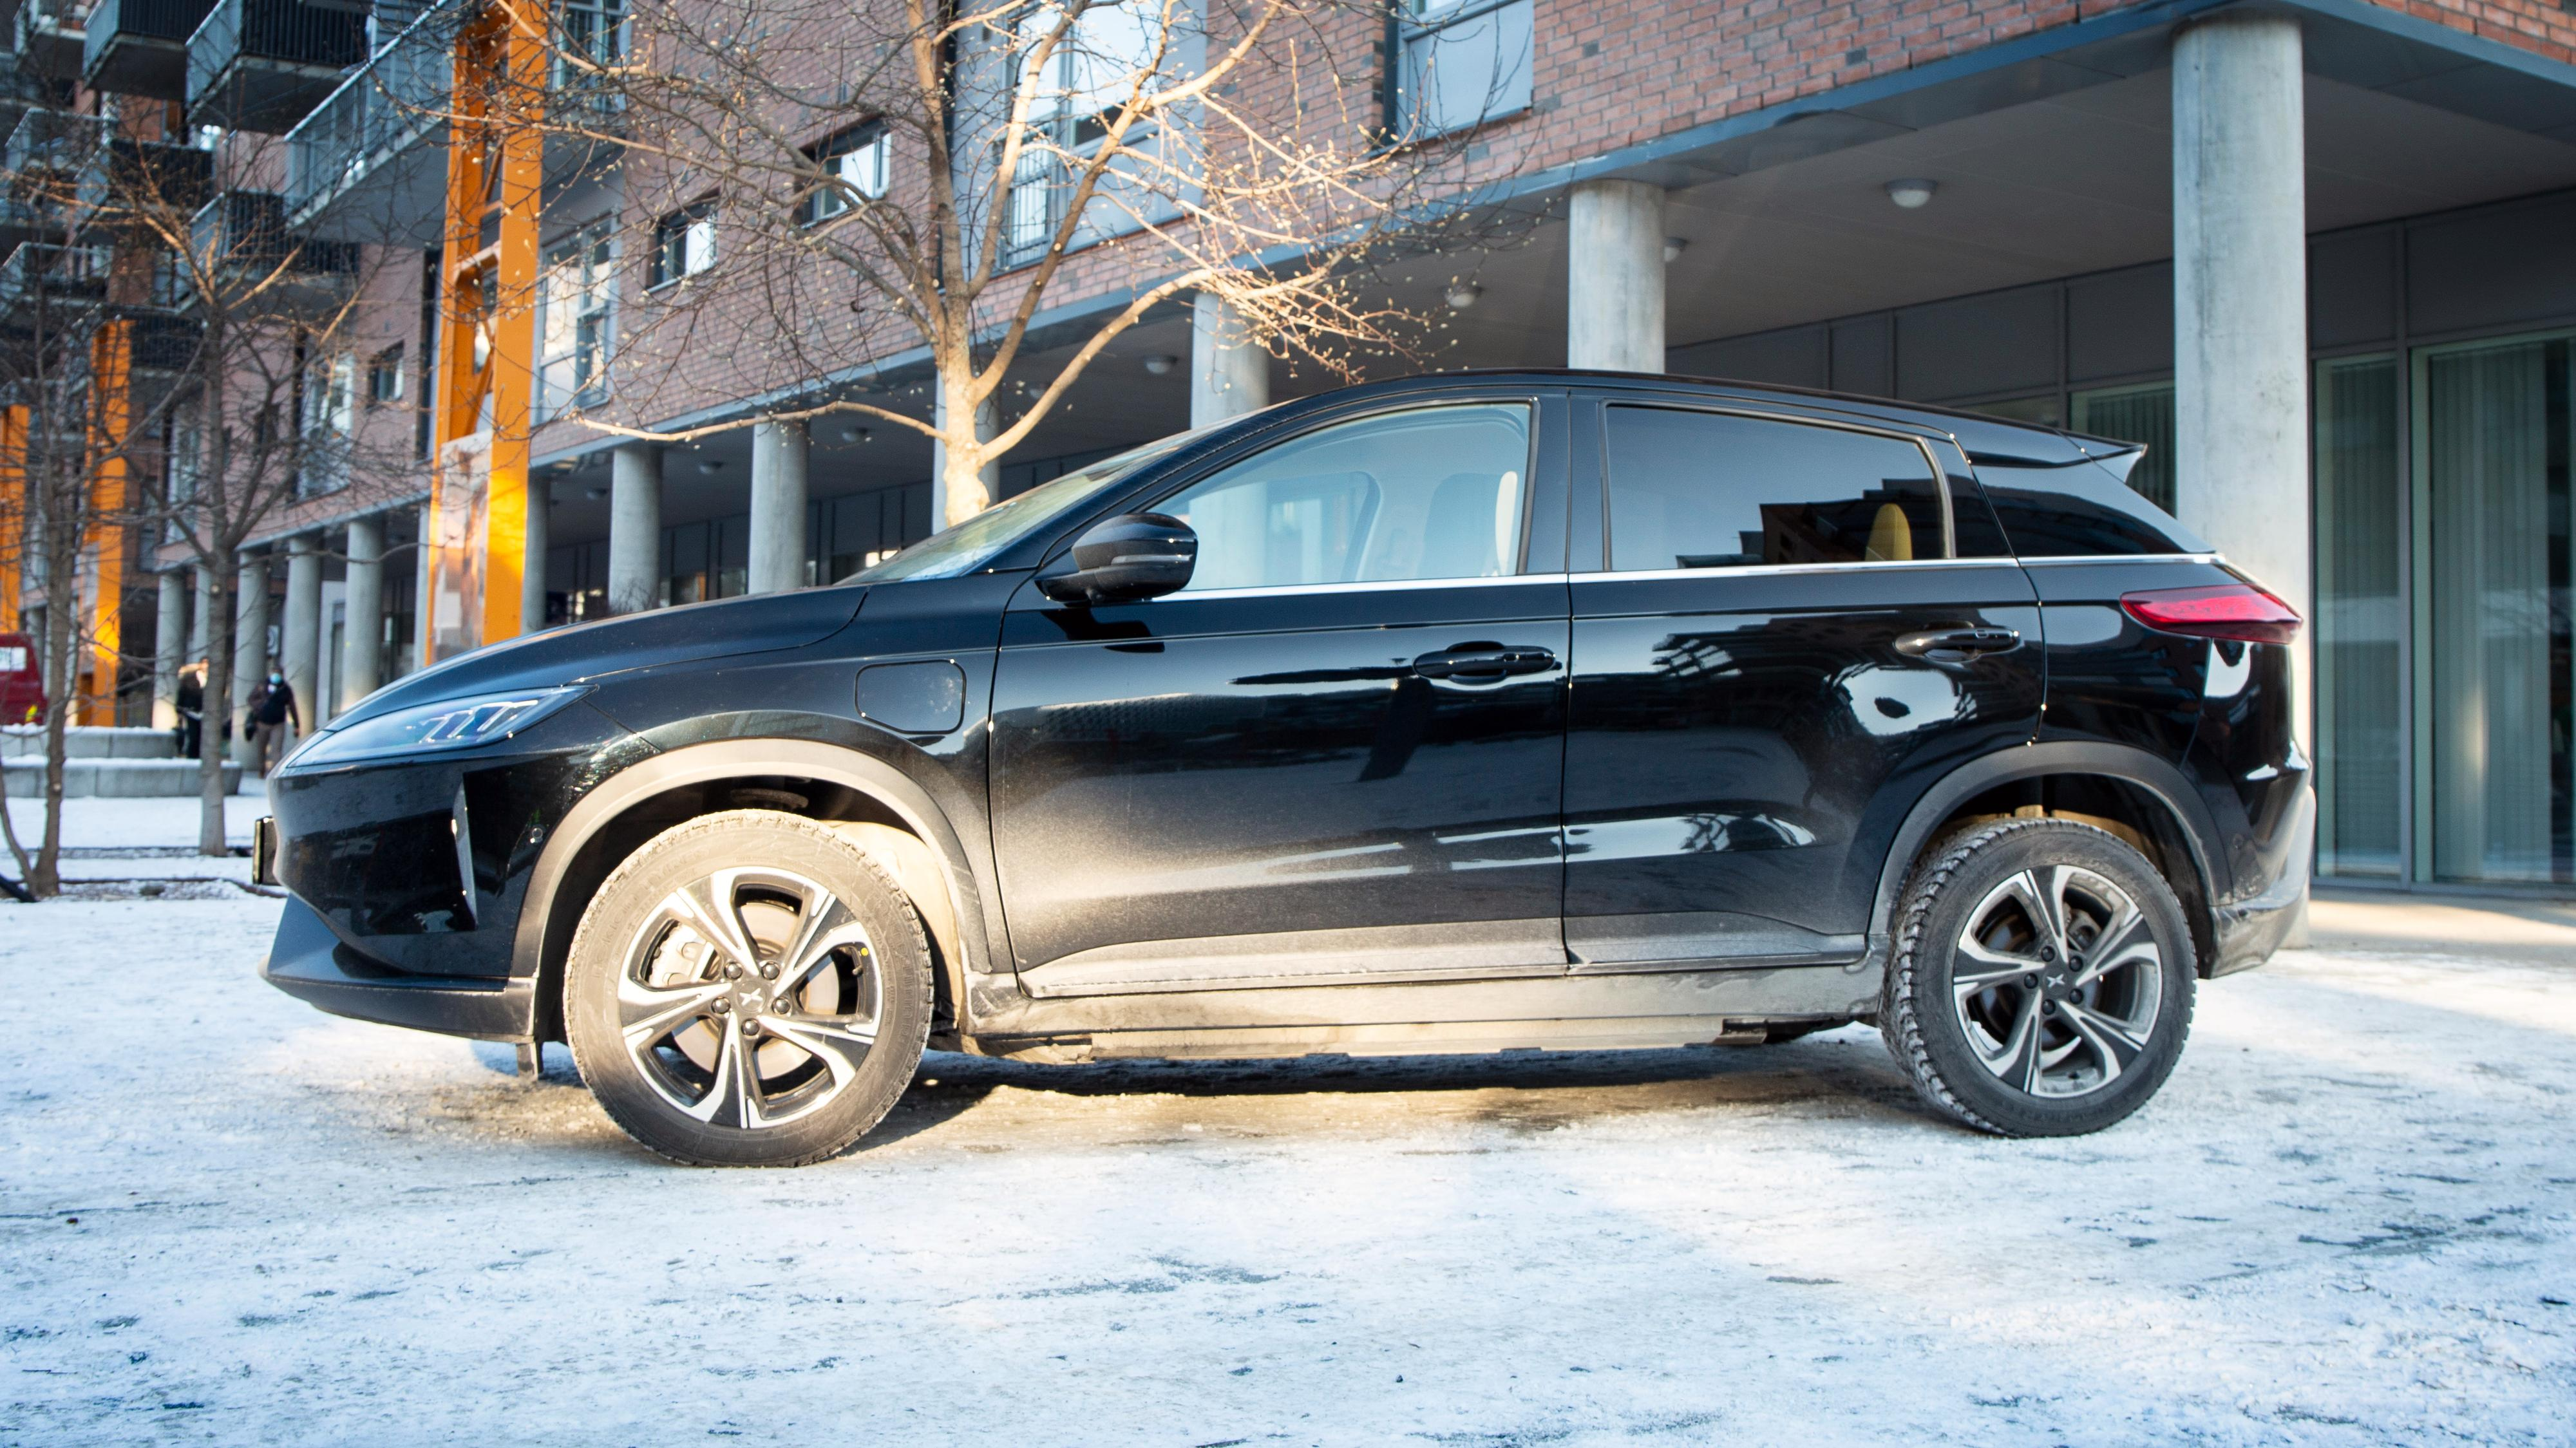 Xpeng G3 er en kompakt-SUV på 4,45 meter i lengde.